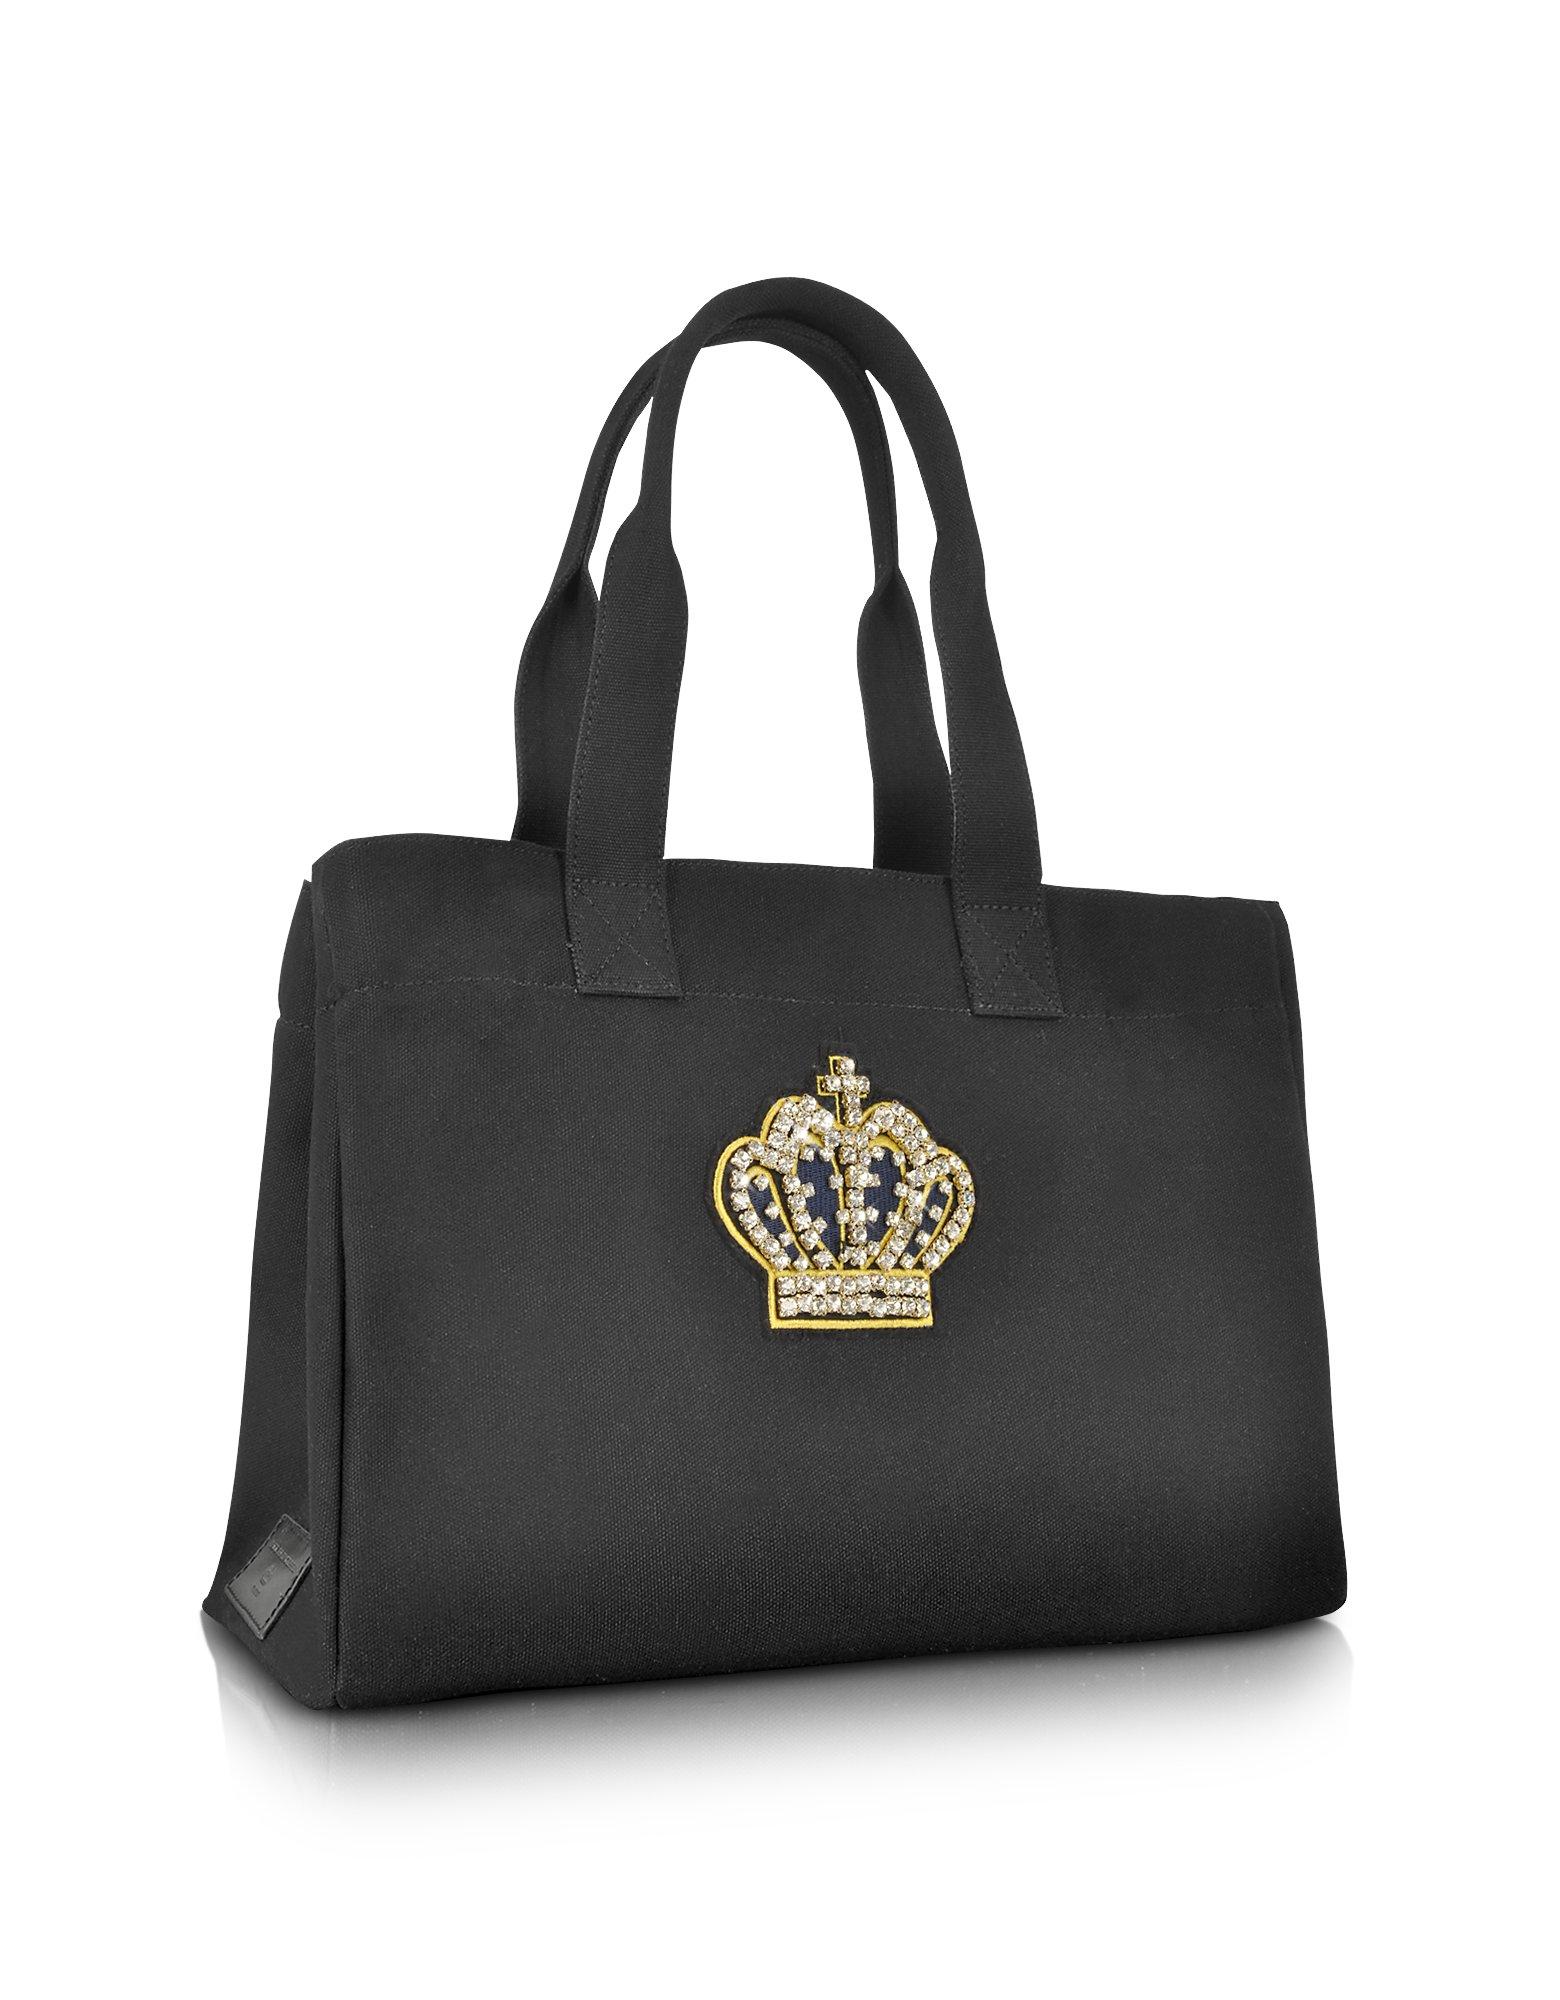 rue princesse pop couture crown canvas tote bag in black. Black Bedroom Furniture Sets. Home Design Ideas